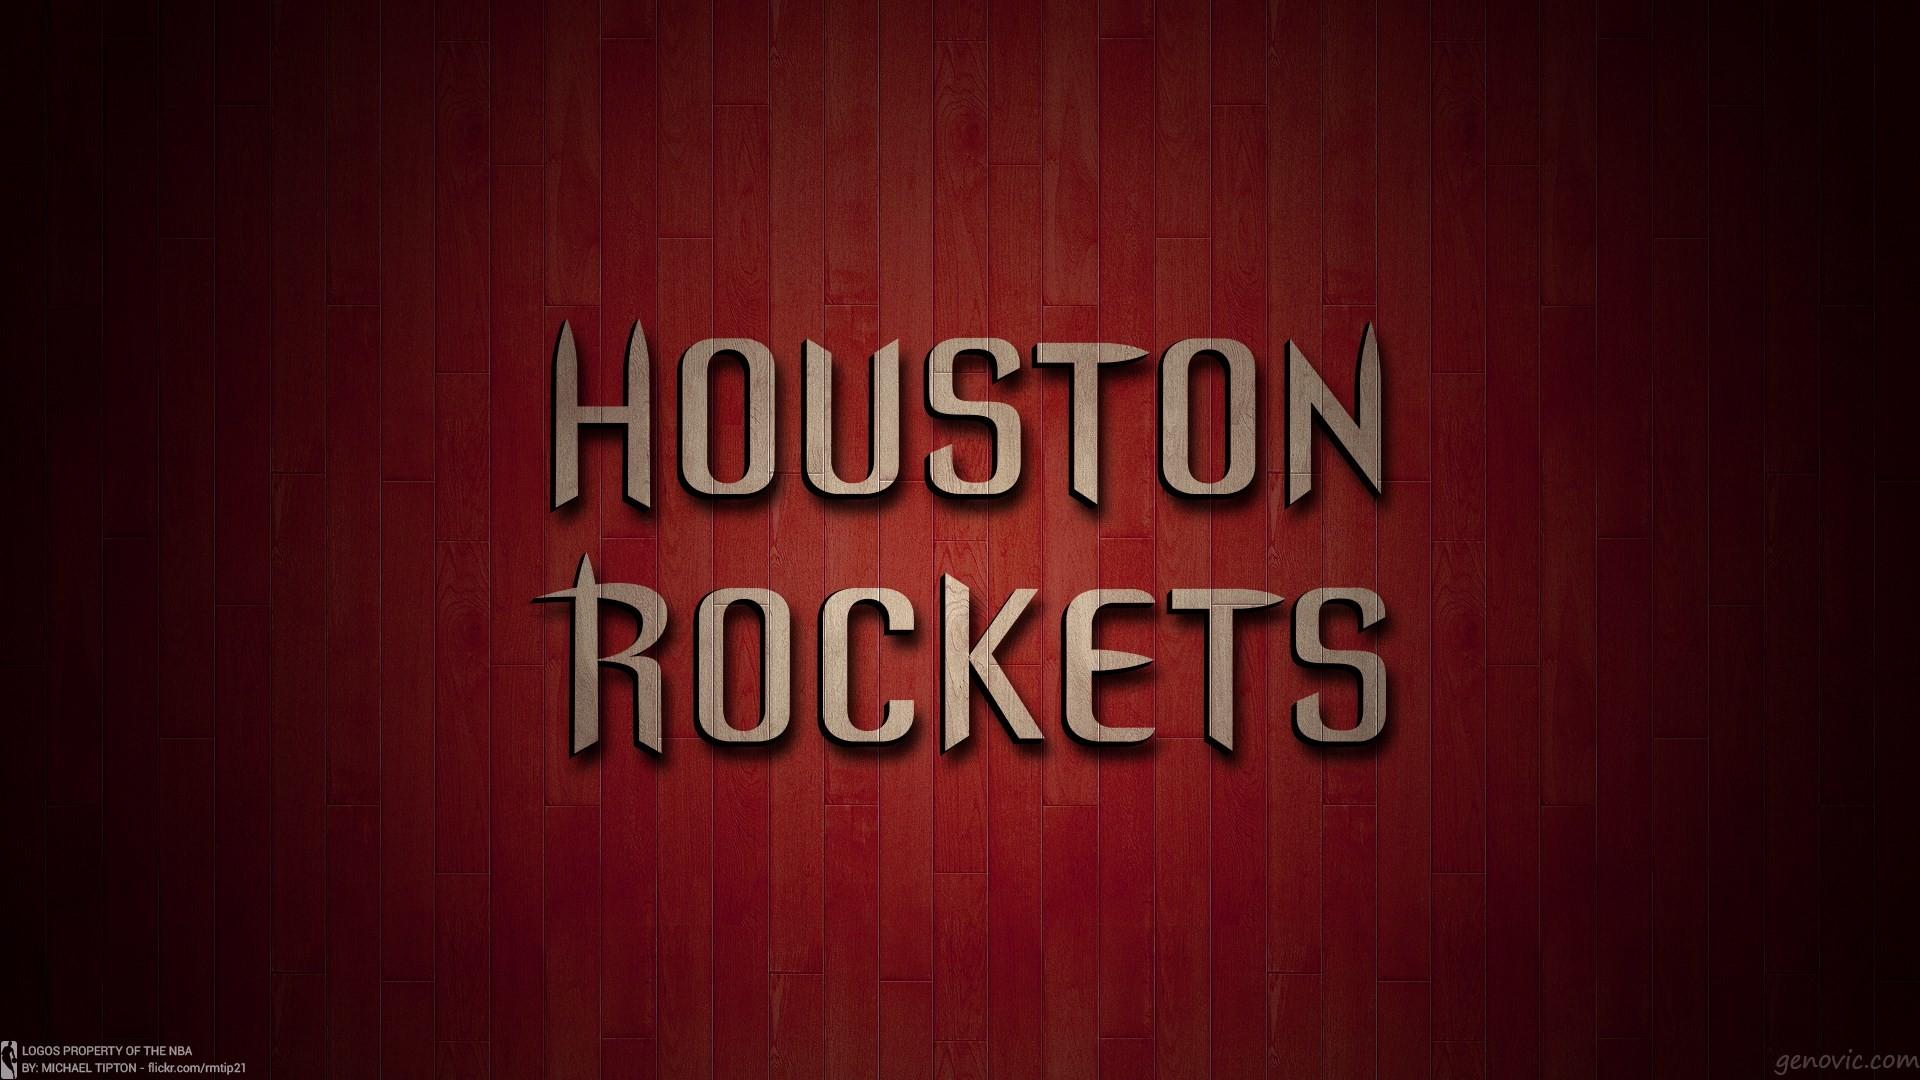 Rockets Wallpaper   Houston Rockets   Images Wallpapers   Pinterest    Wallpaper